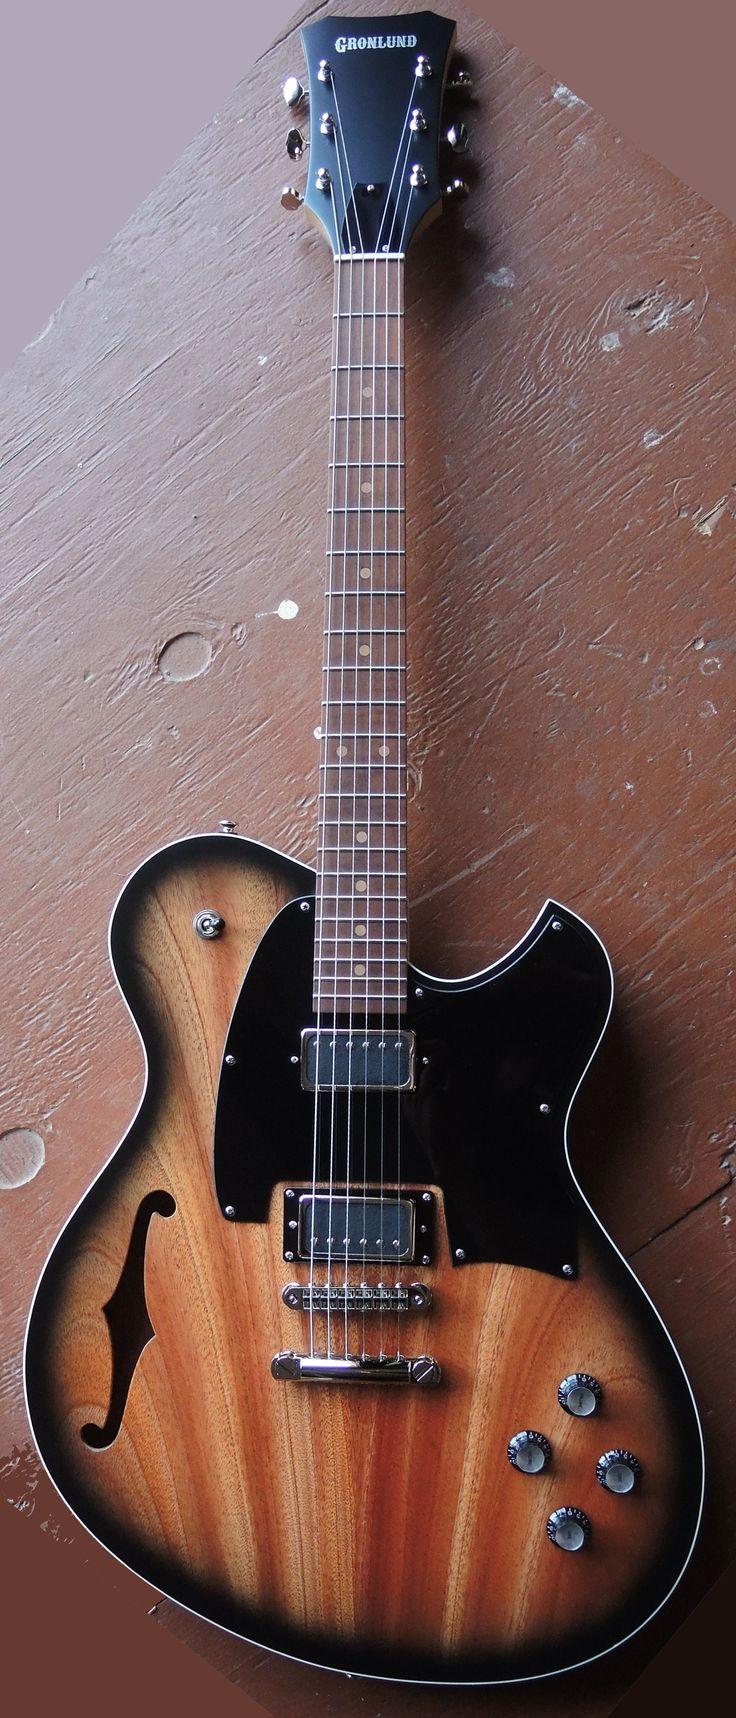 Gronlund OS15 semi-acoustic Guitar with a satin sunburst finish --- https://www.pinterest.com/lardyfatboy/